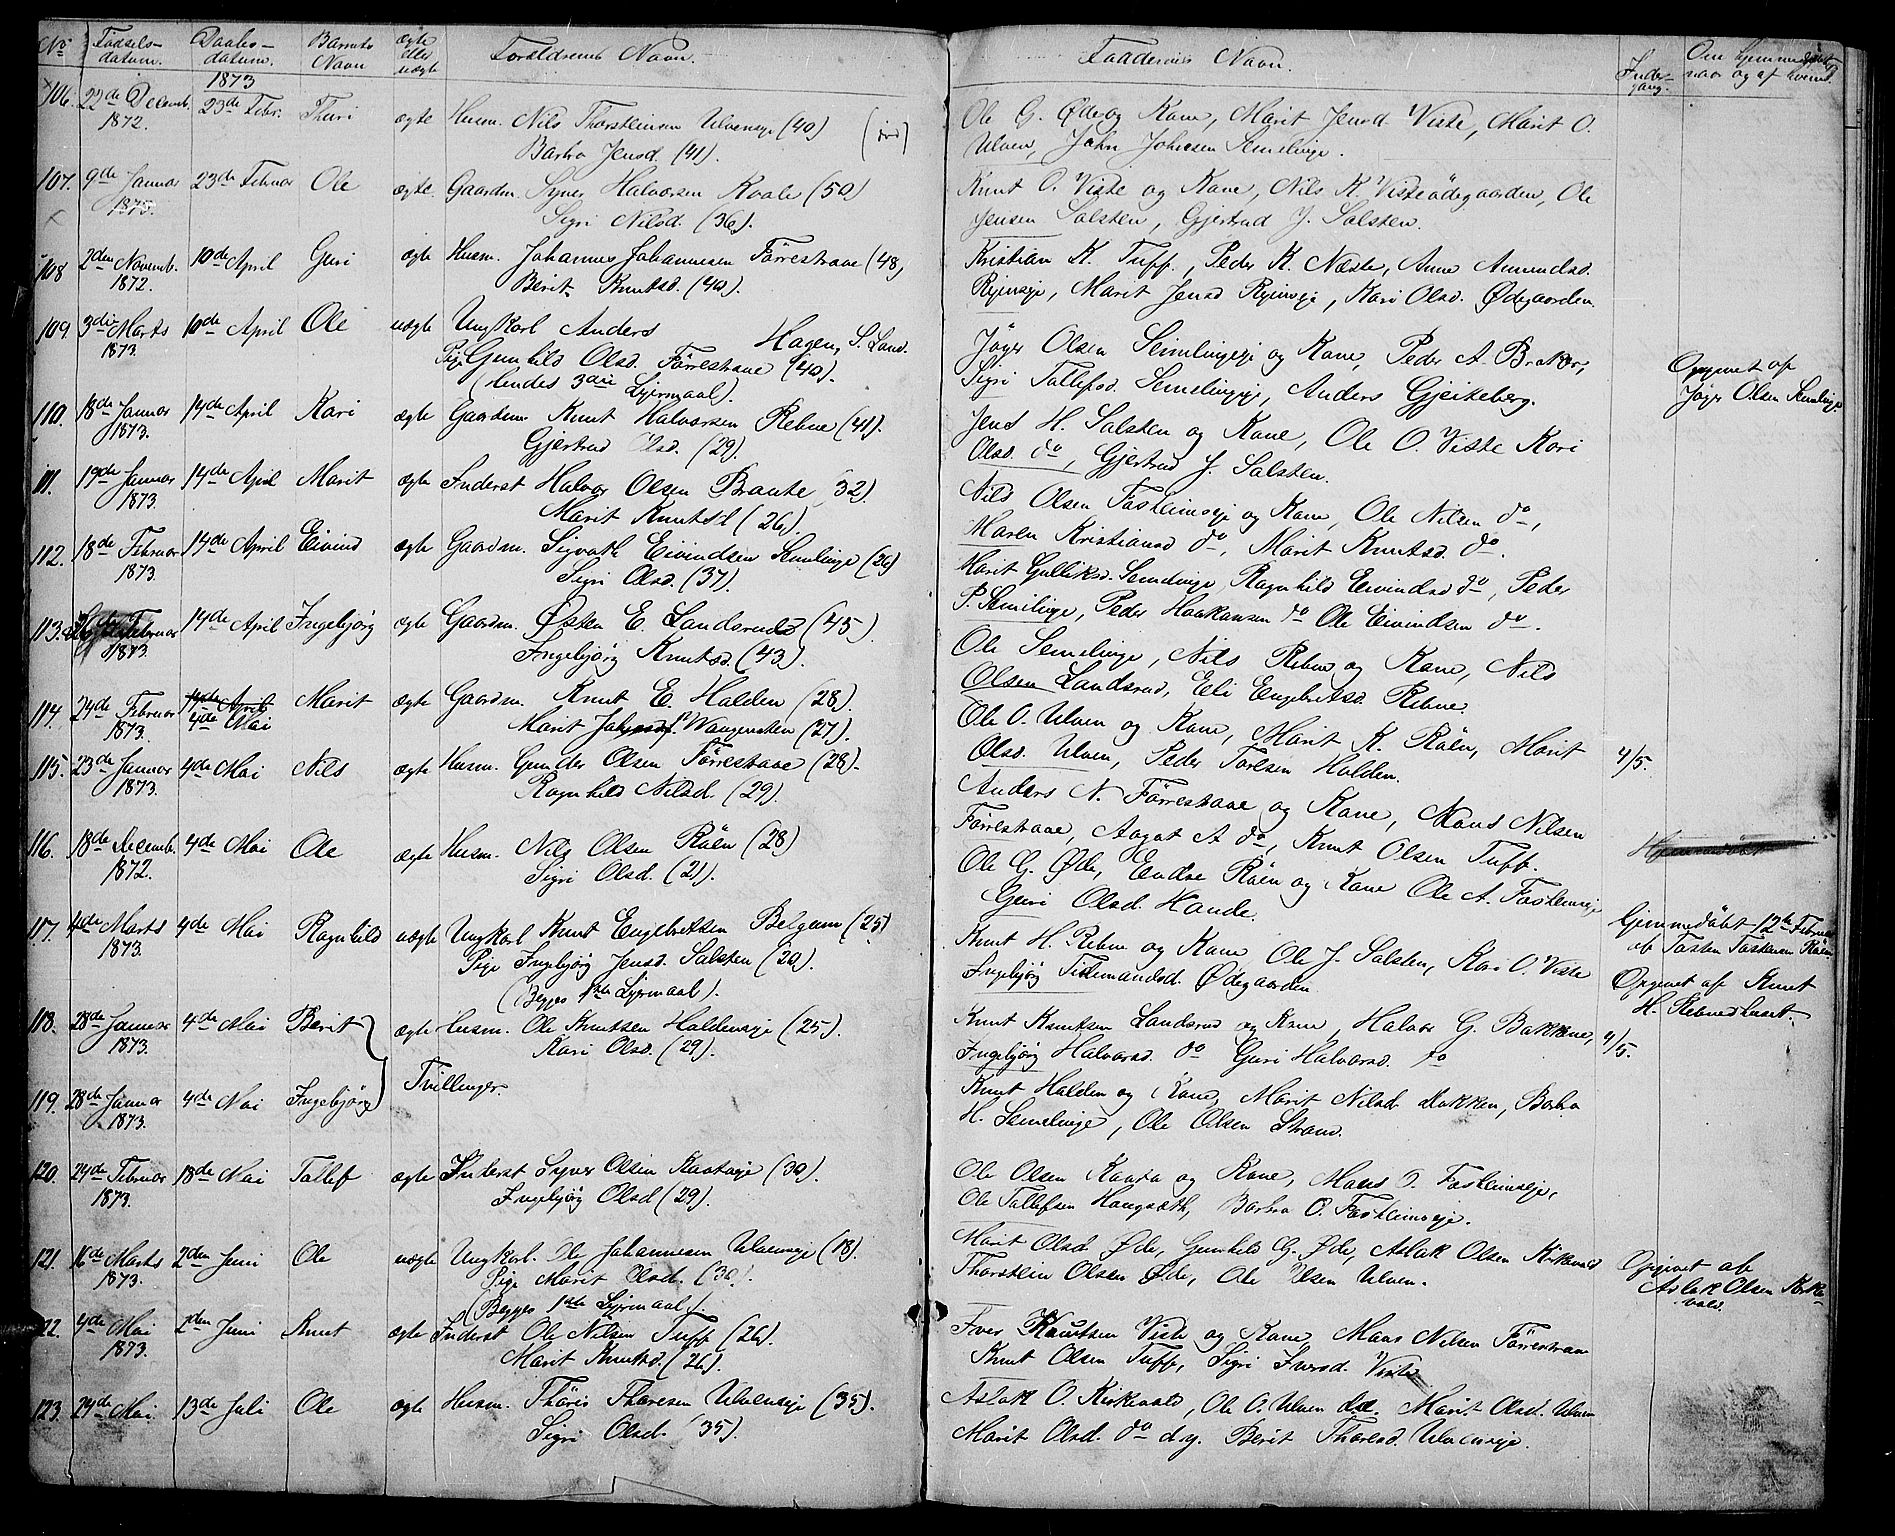 SAH, Vestre Slidre prestekontor, Klokkerbok nr. 3, 1869-1882, s. 9